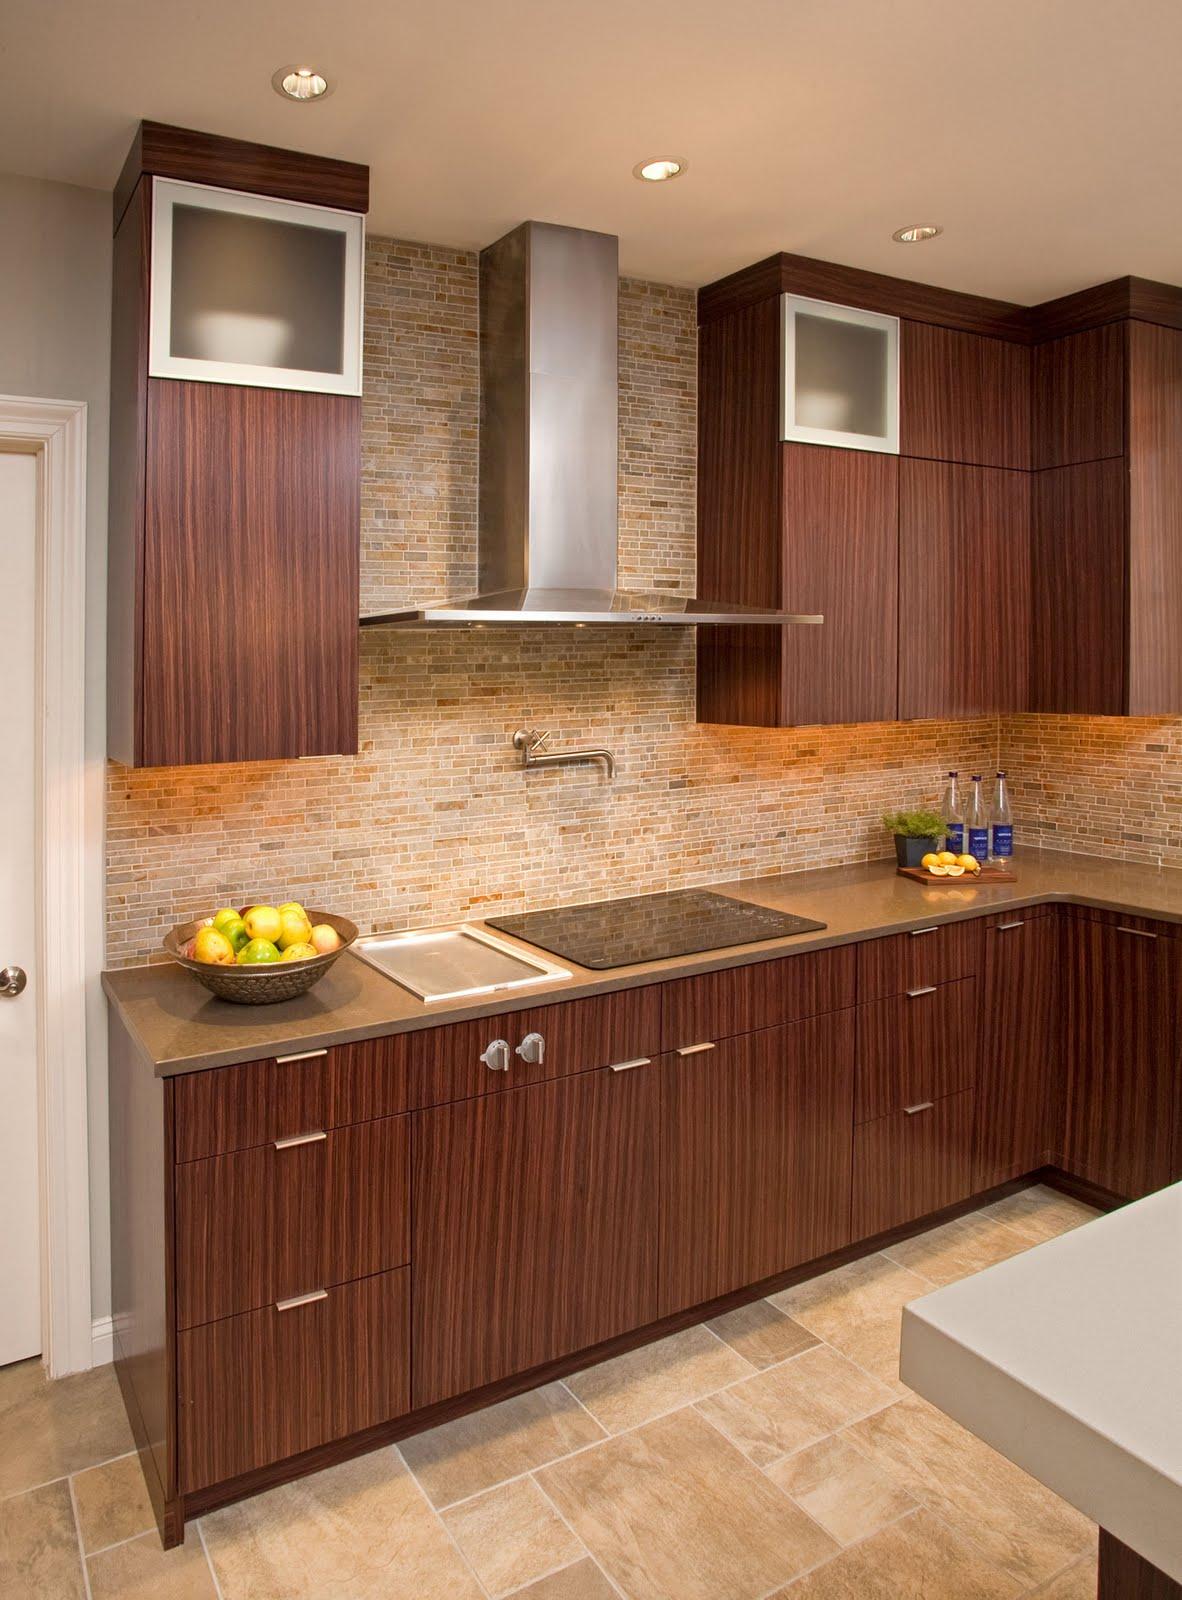 Range Hood Kitchen Faber Rangehoods Stunning Kitchen Using The Faber Diamante Wall